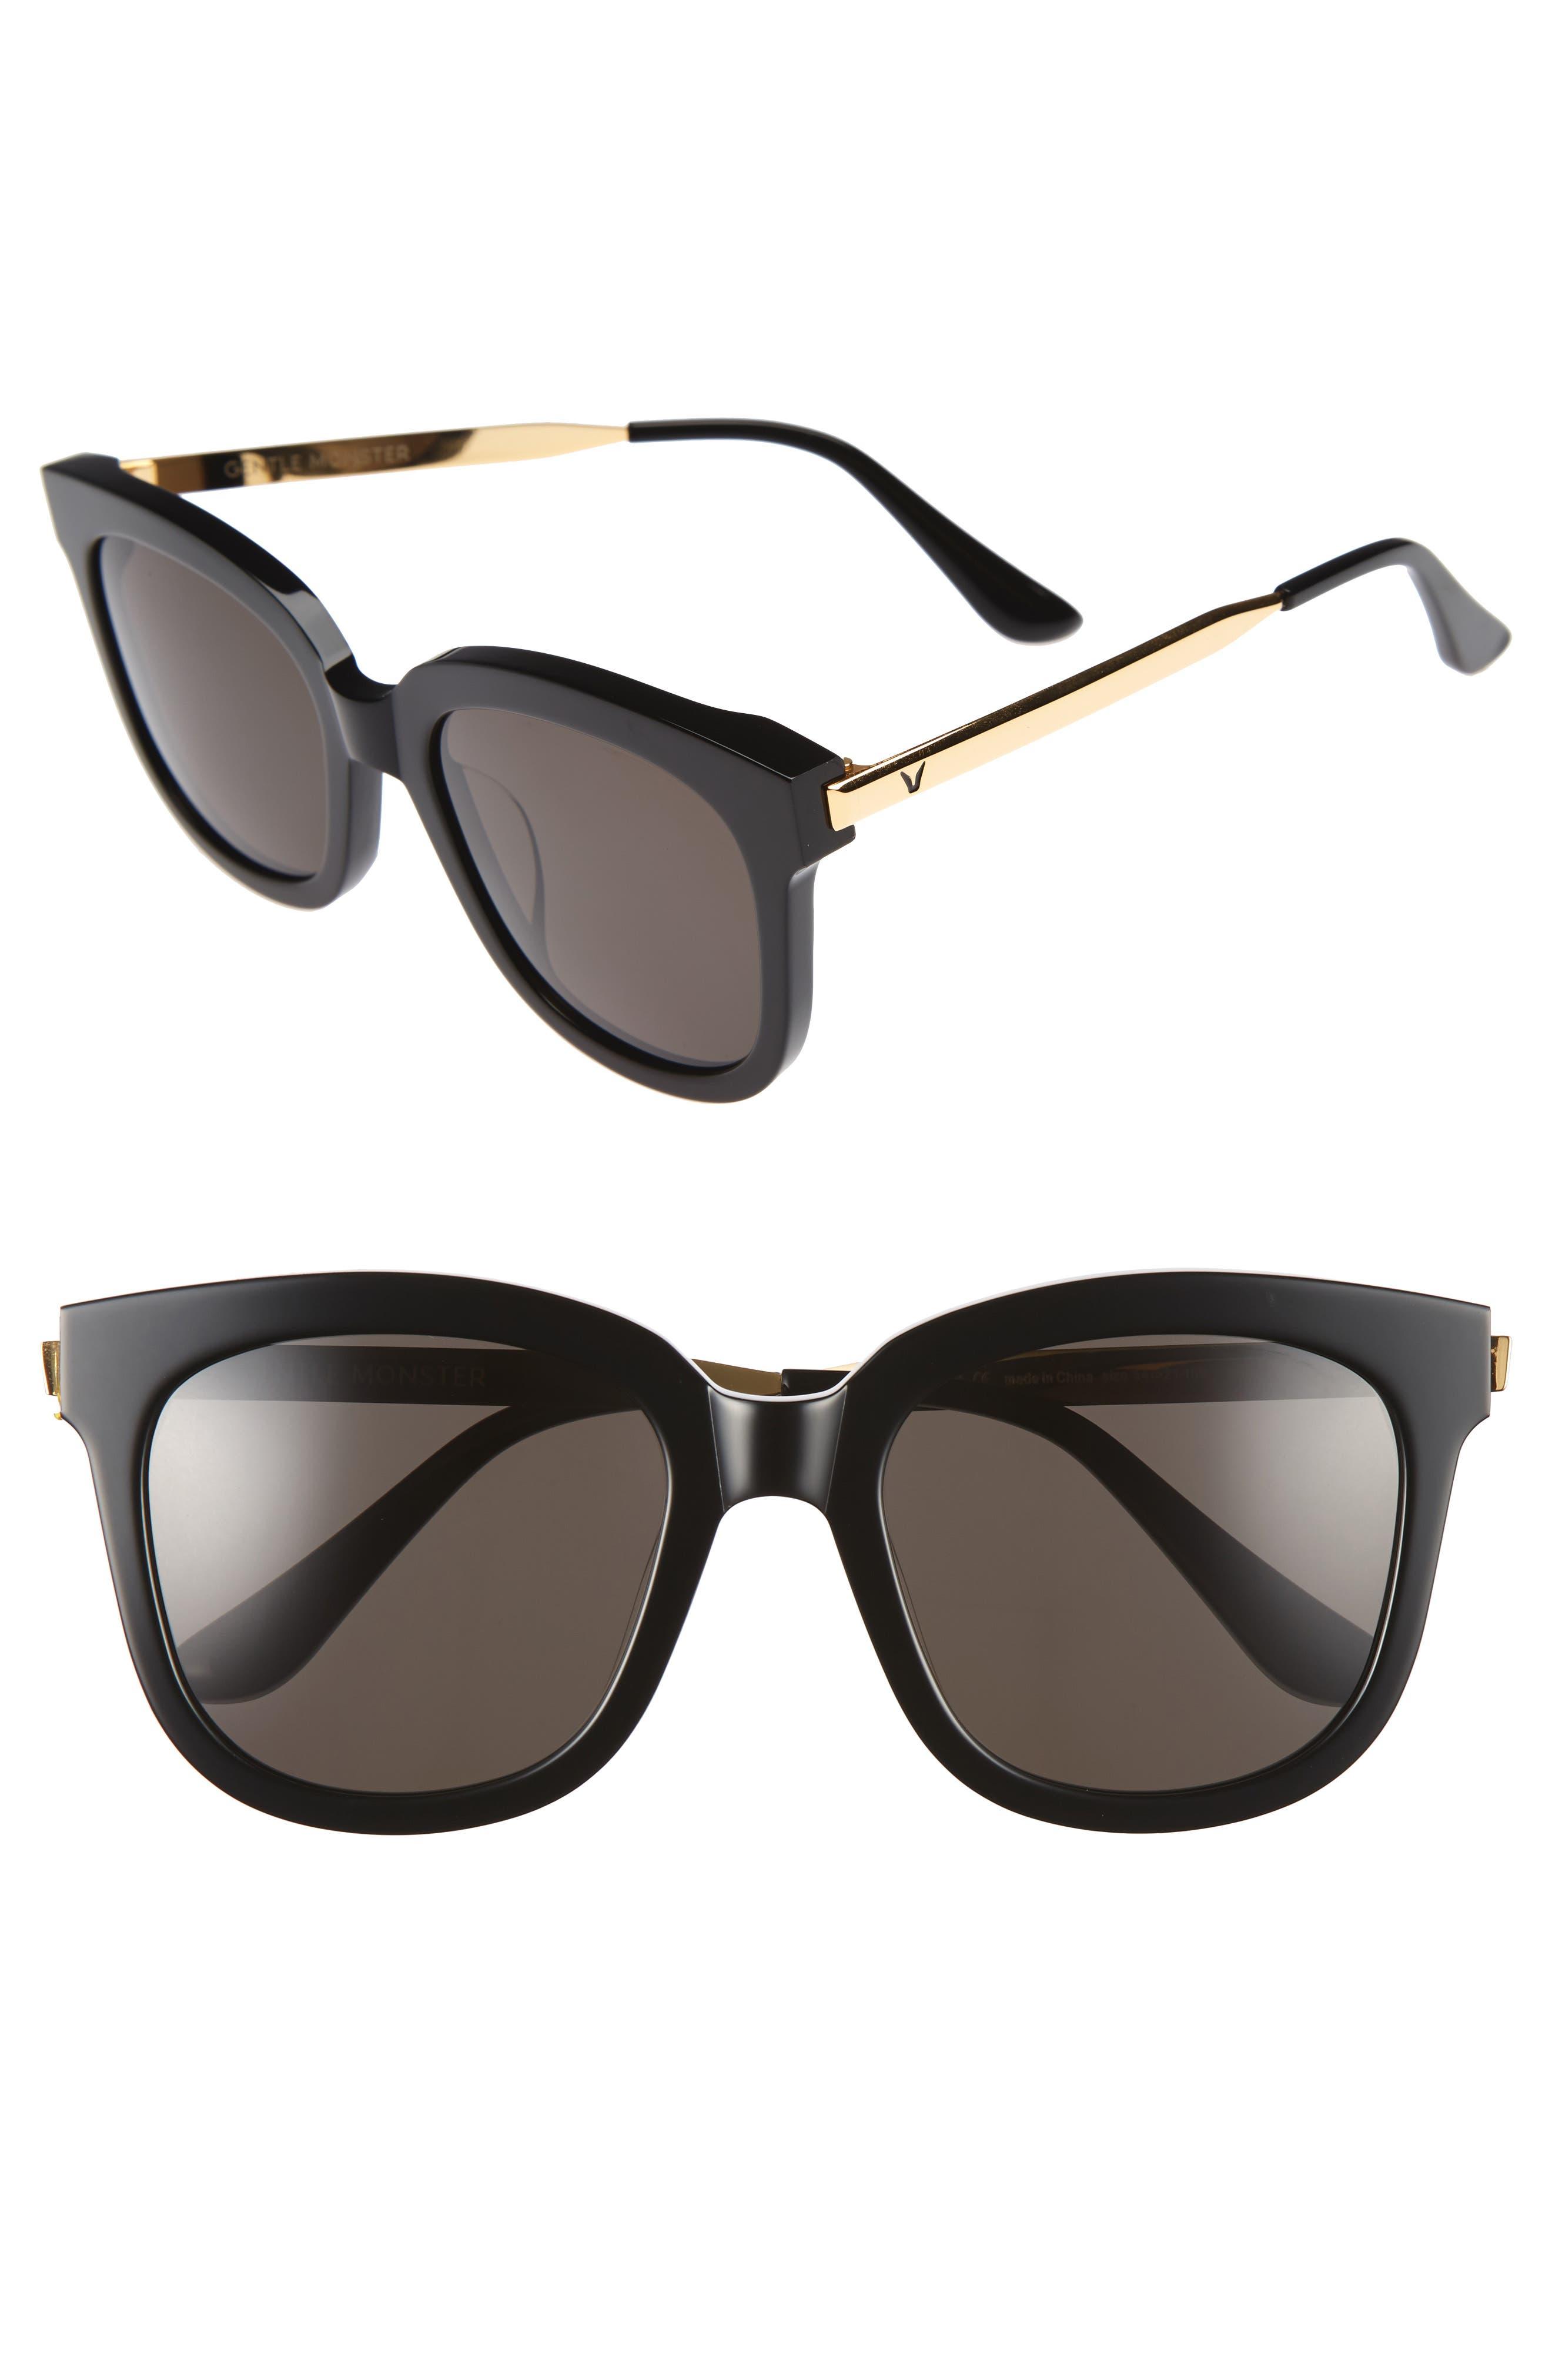 Absente 54mm Sunglasses,                             Main thumbnail 1, color,                             001